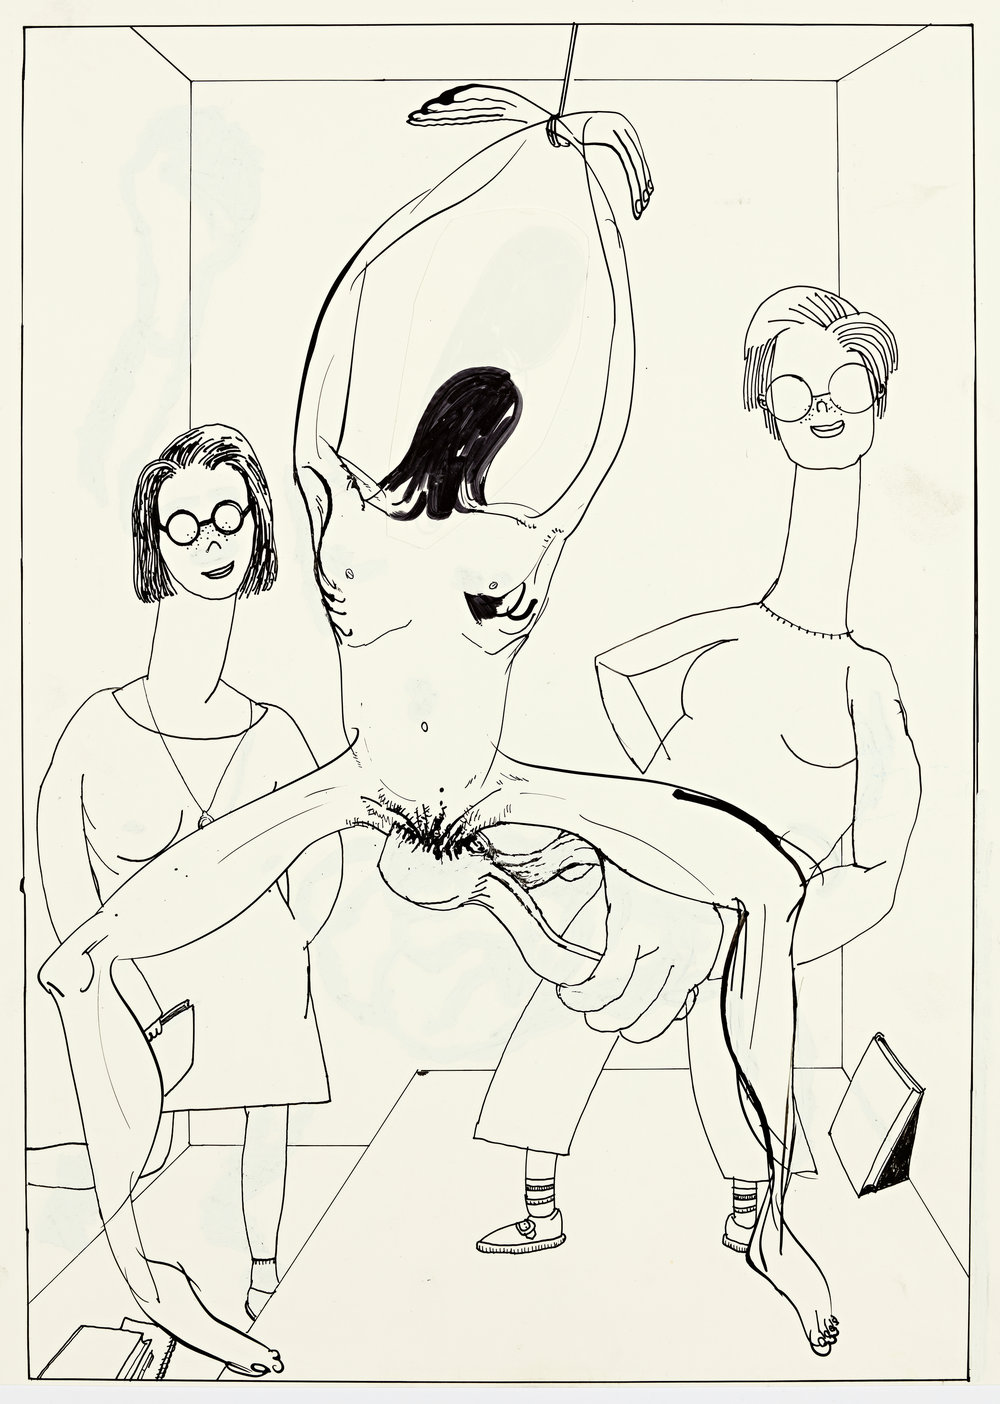 Misandry, 1994